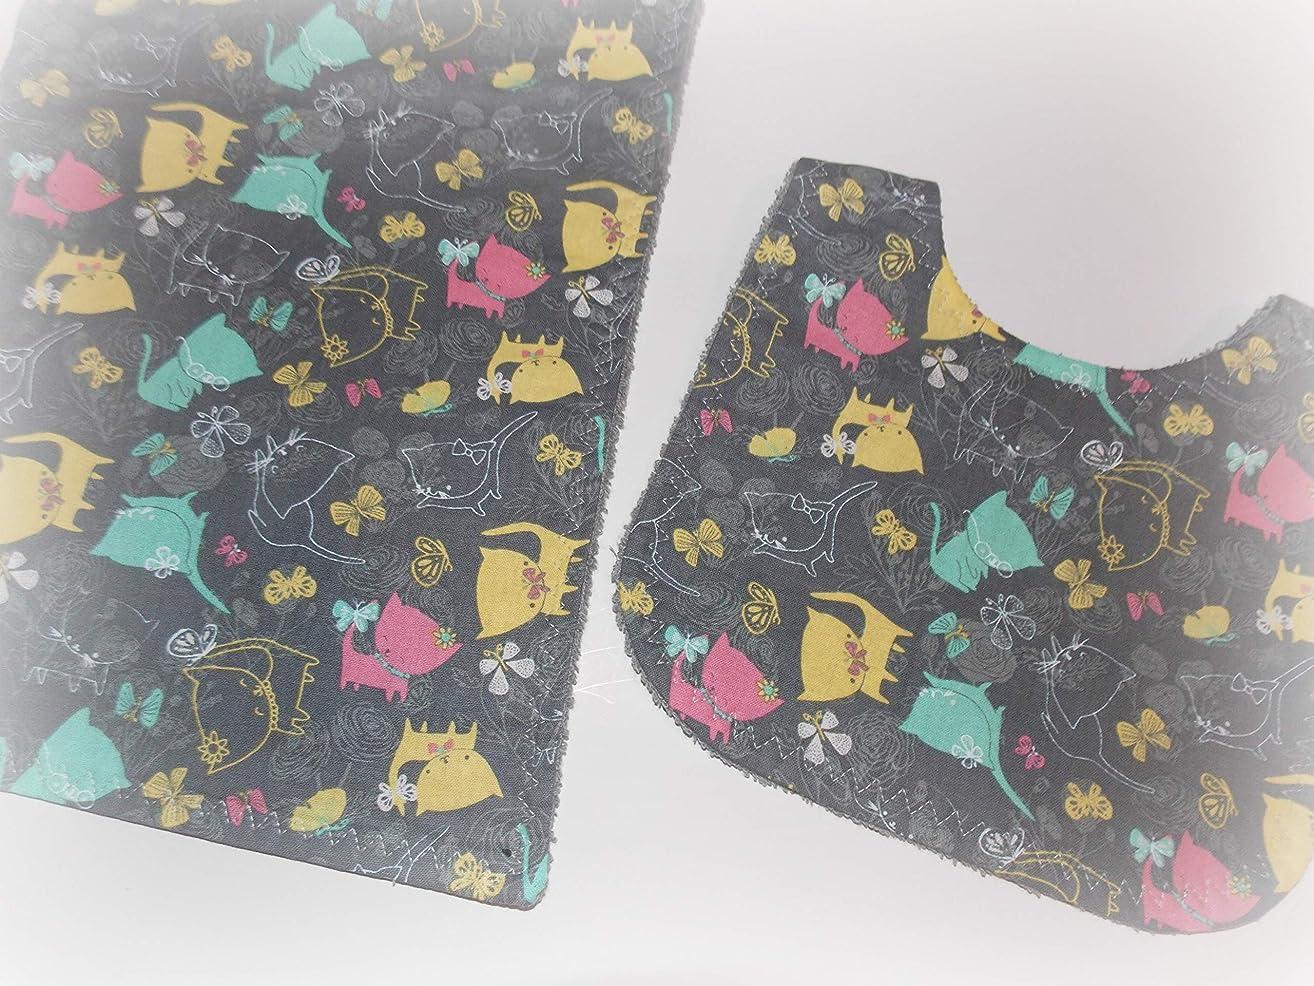 Handmade girl baby bib and burp cloth with kitty cat fabric